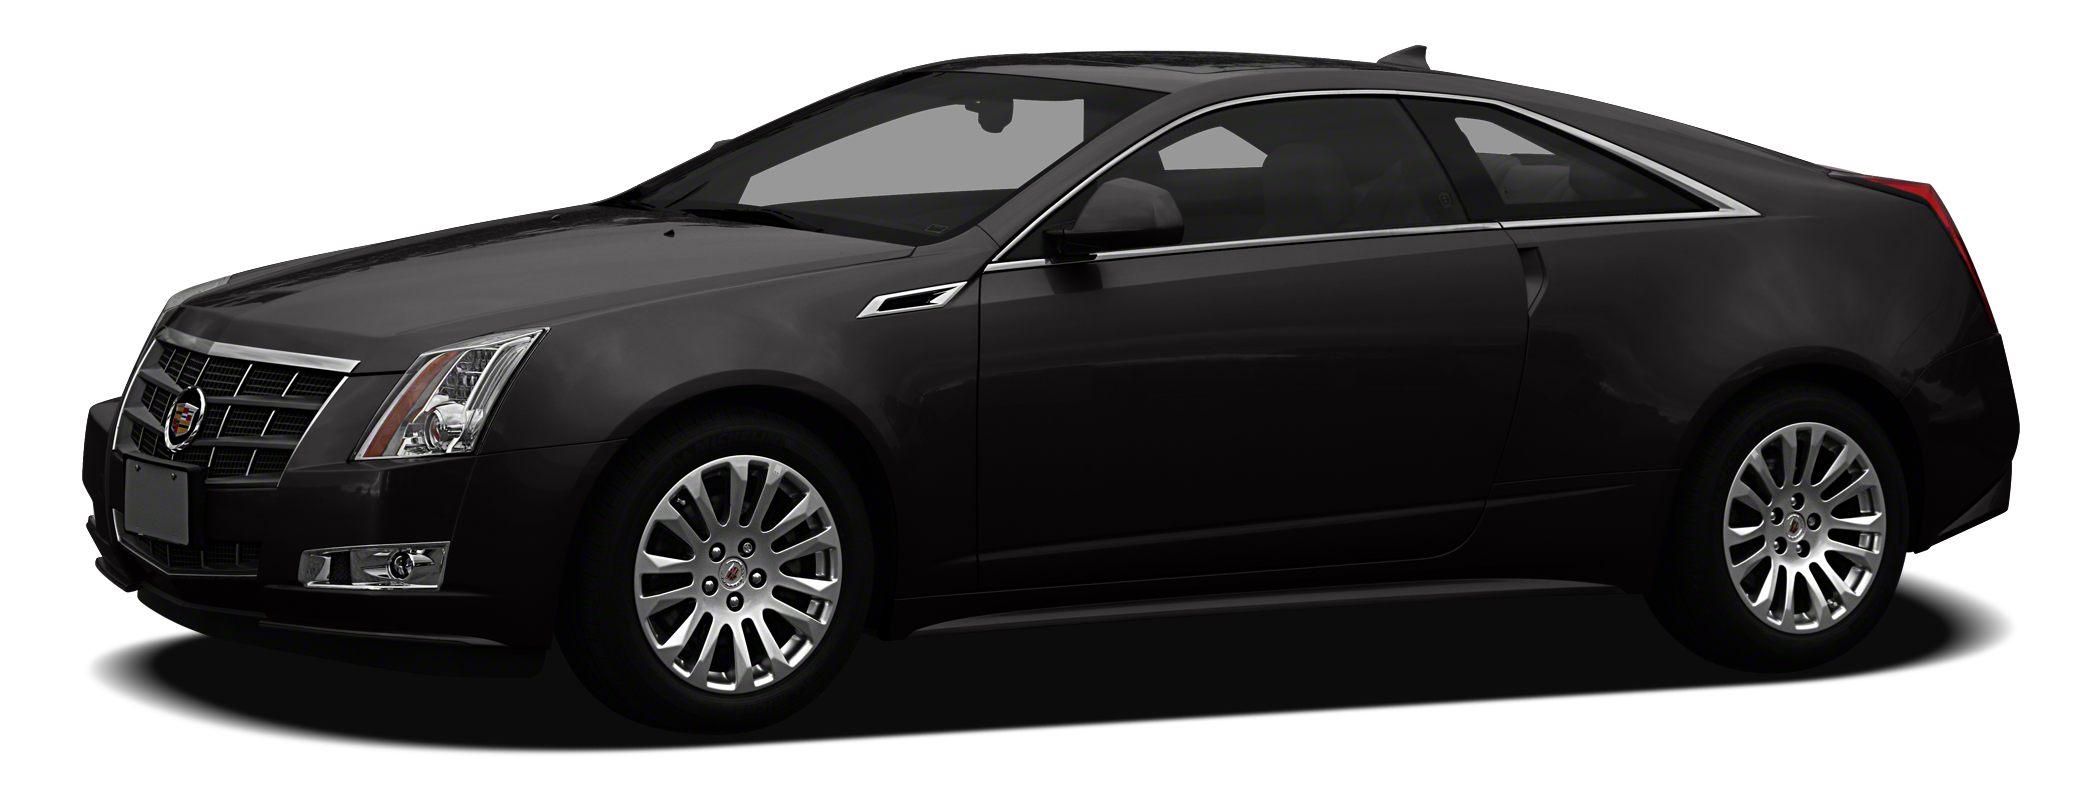 2011 Cadillac CTS Performance Miles 55450Color Black Raven Stock 624649C VIN 1G6DJ1EDXB01552